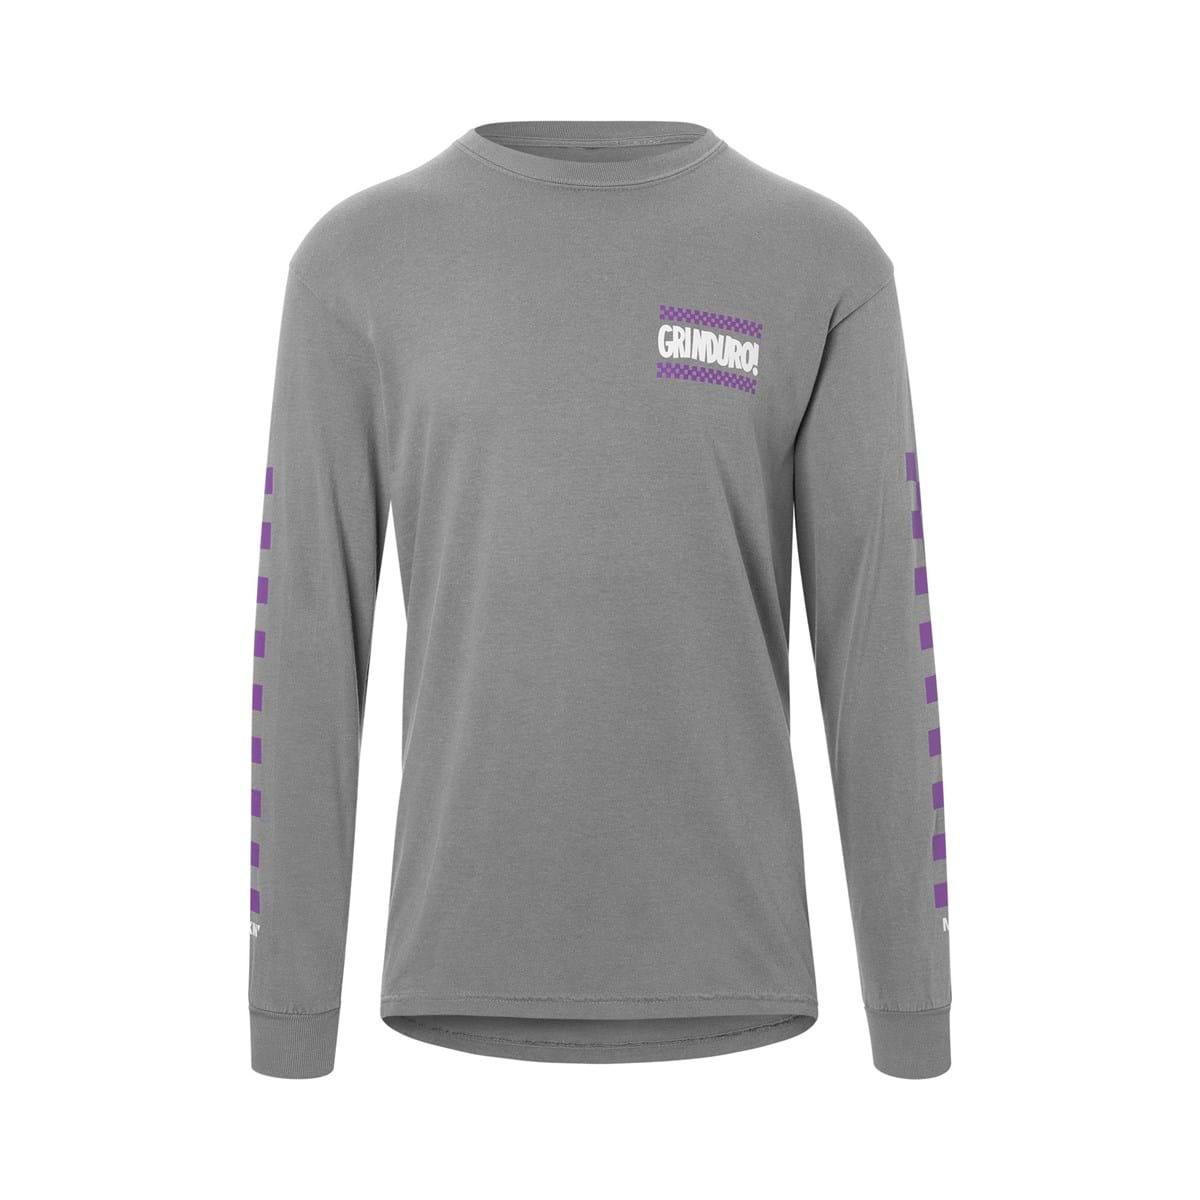 Grinduro Men's Long Sleeve Jersey